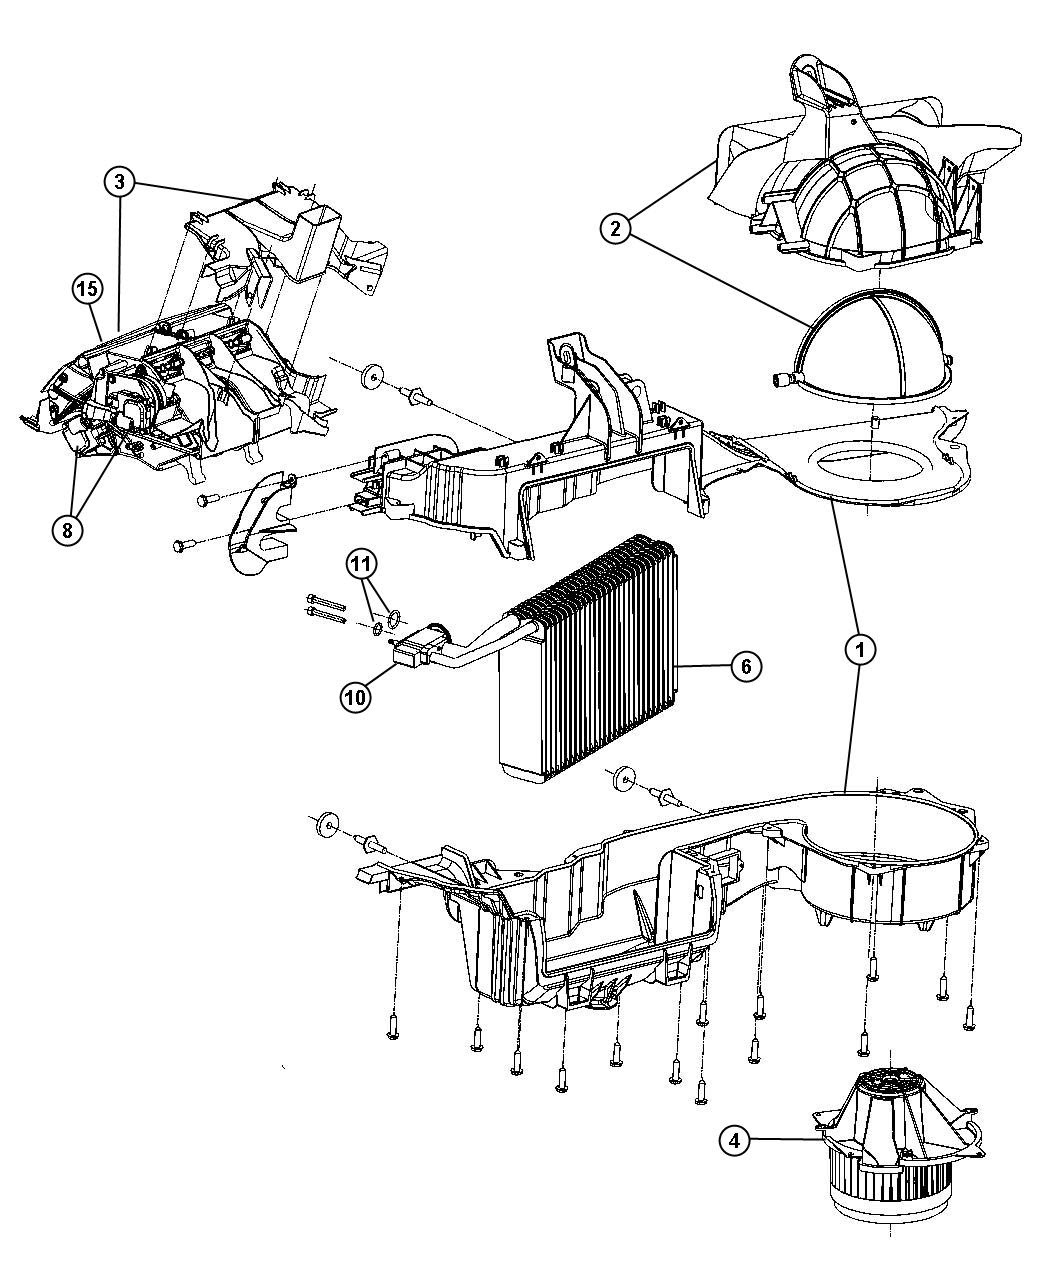 [DIAGRAM] Wiring Diagram Dodge Nitro 2007 En Espa Ol FULL